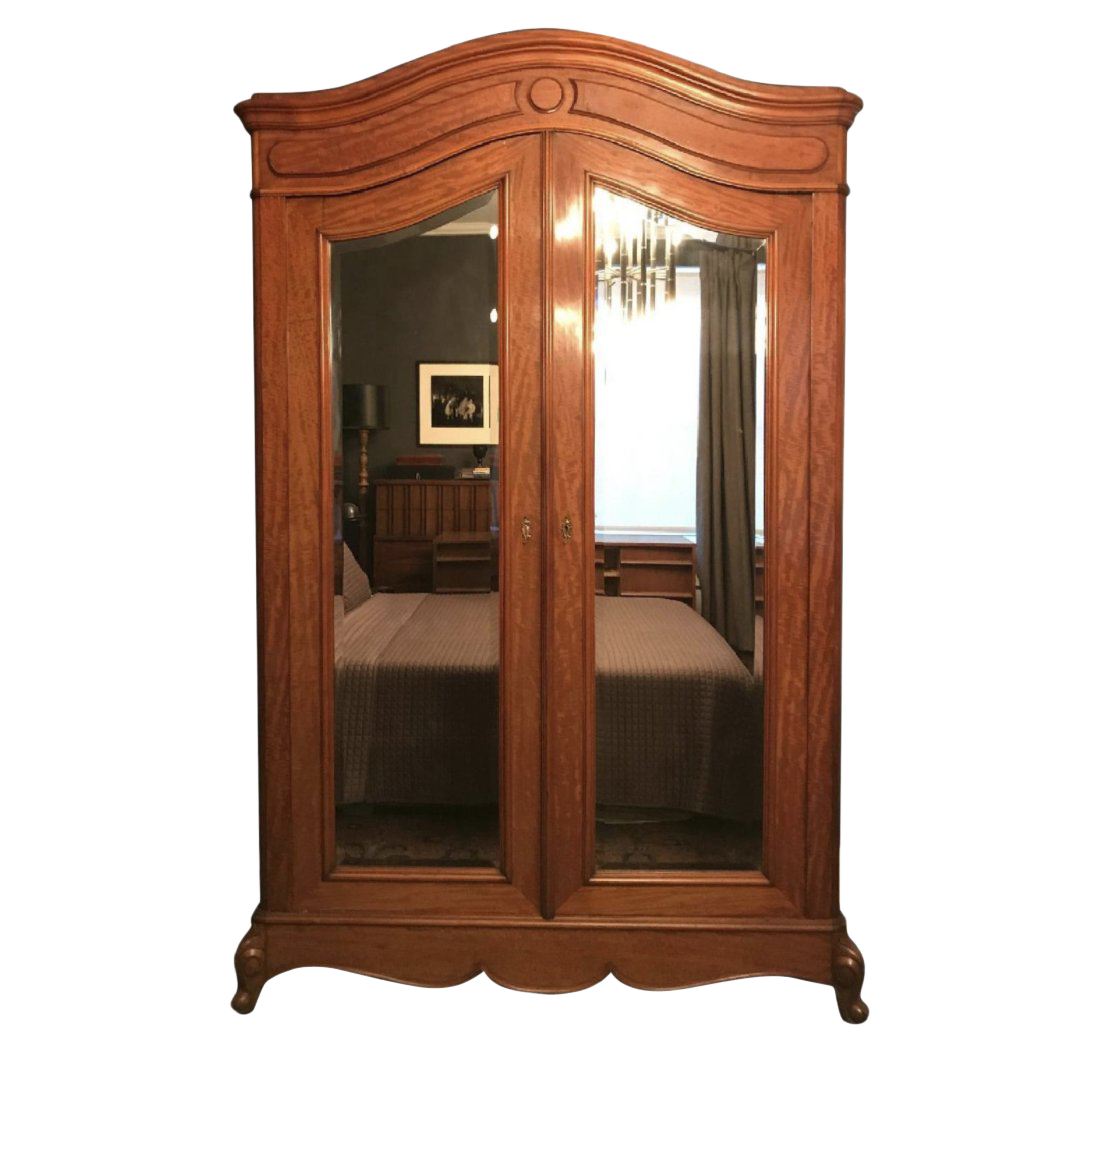 19th Century French Walnut Wardrobe/Armoire